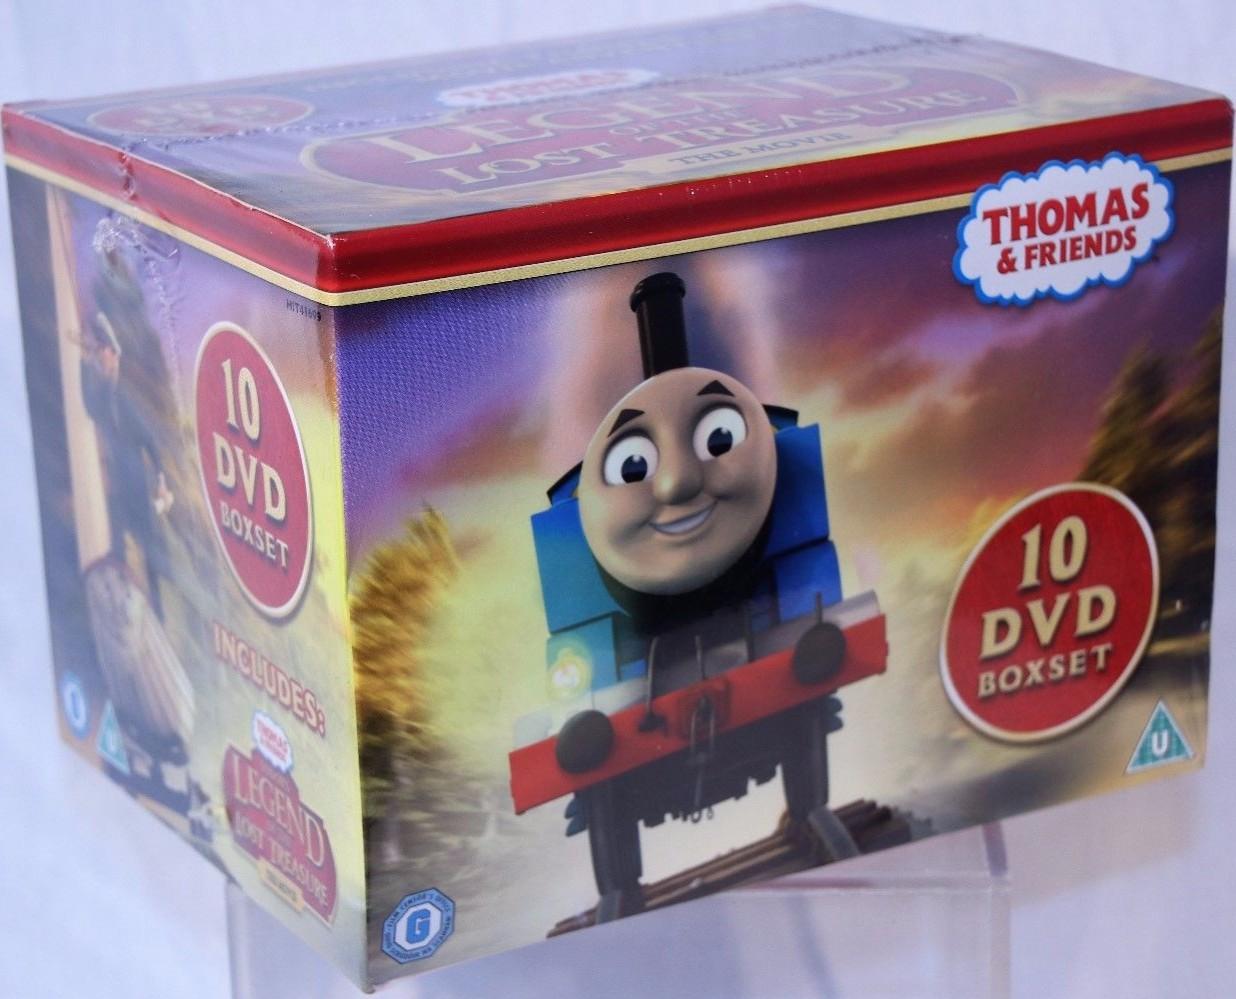 10 DVD Boxset (2015)